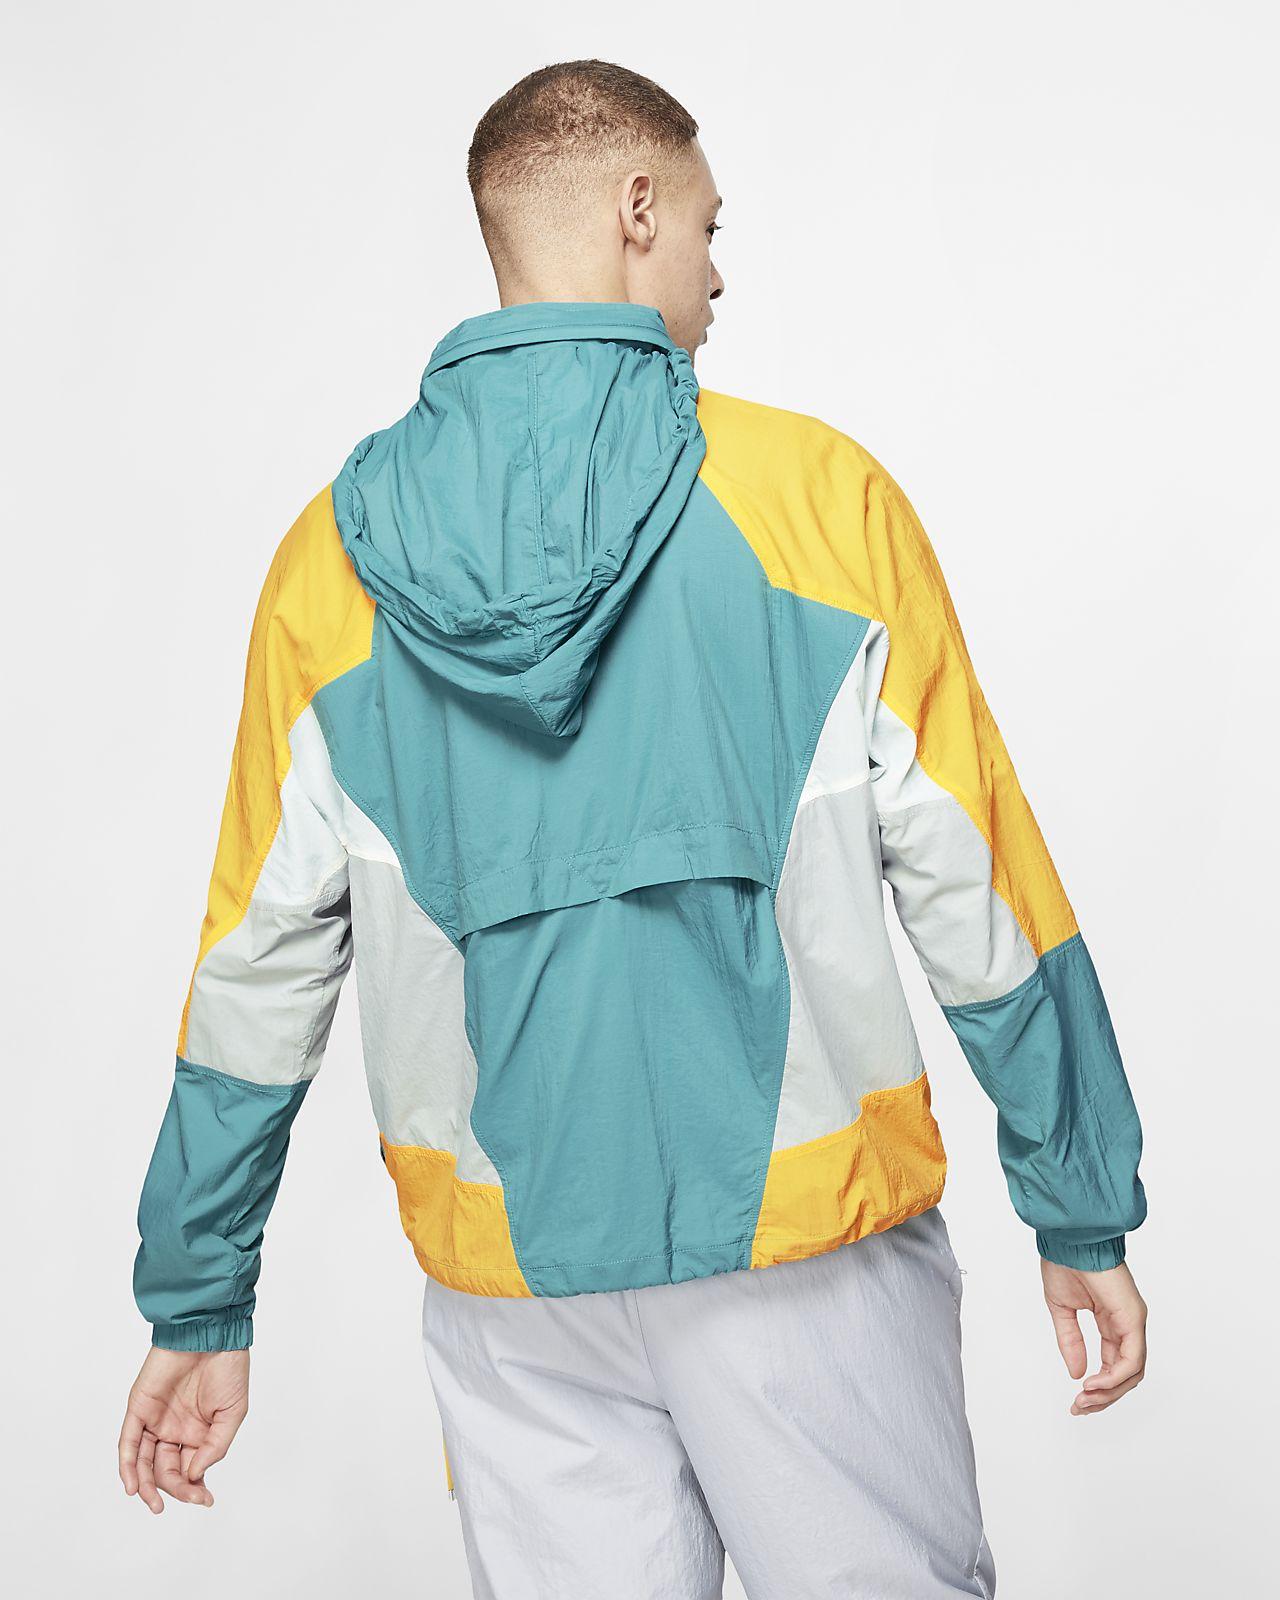 Capucha Nike De Tejido Hombre Chaqueta Sportswear Con Woven kwnP80OX